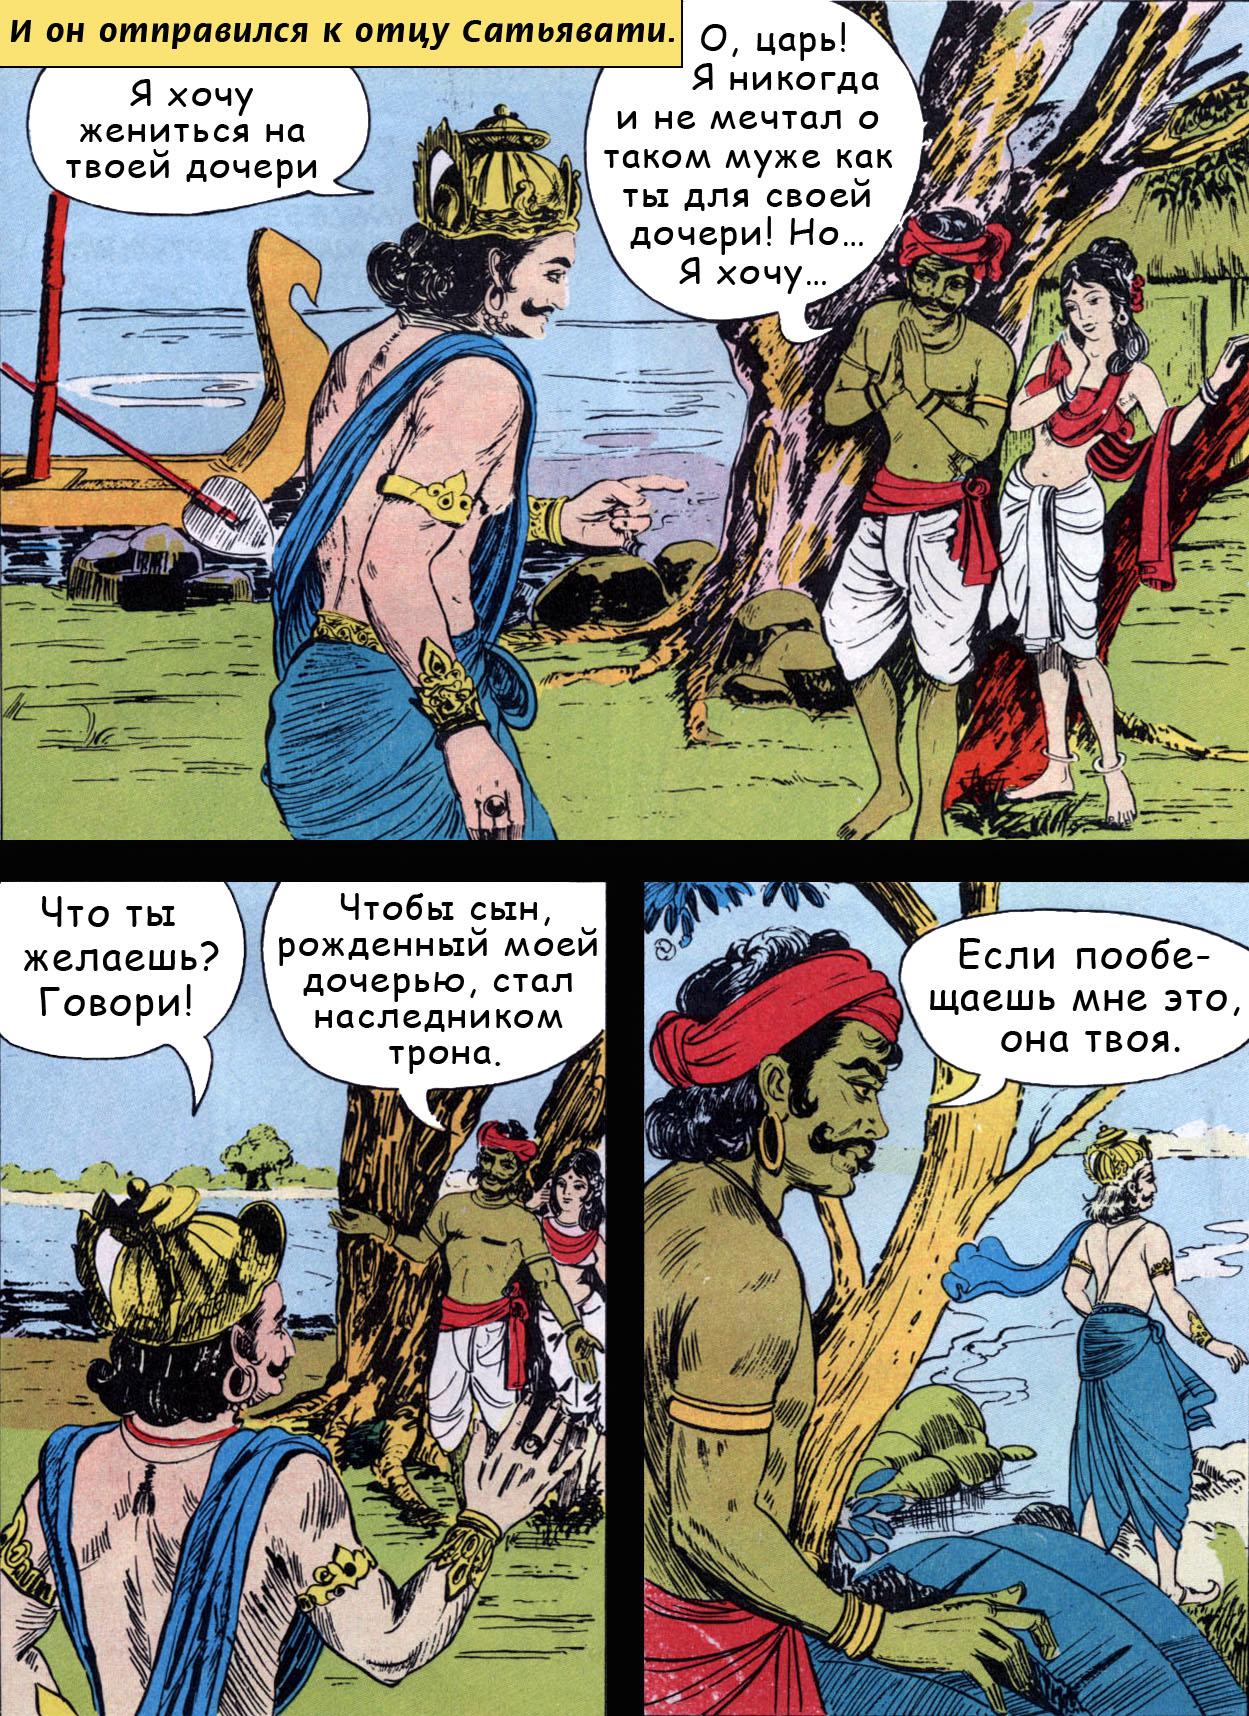 Бхишма 13 - ведический комикс